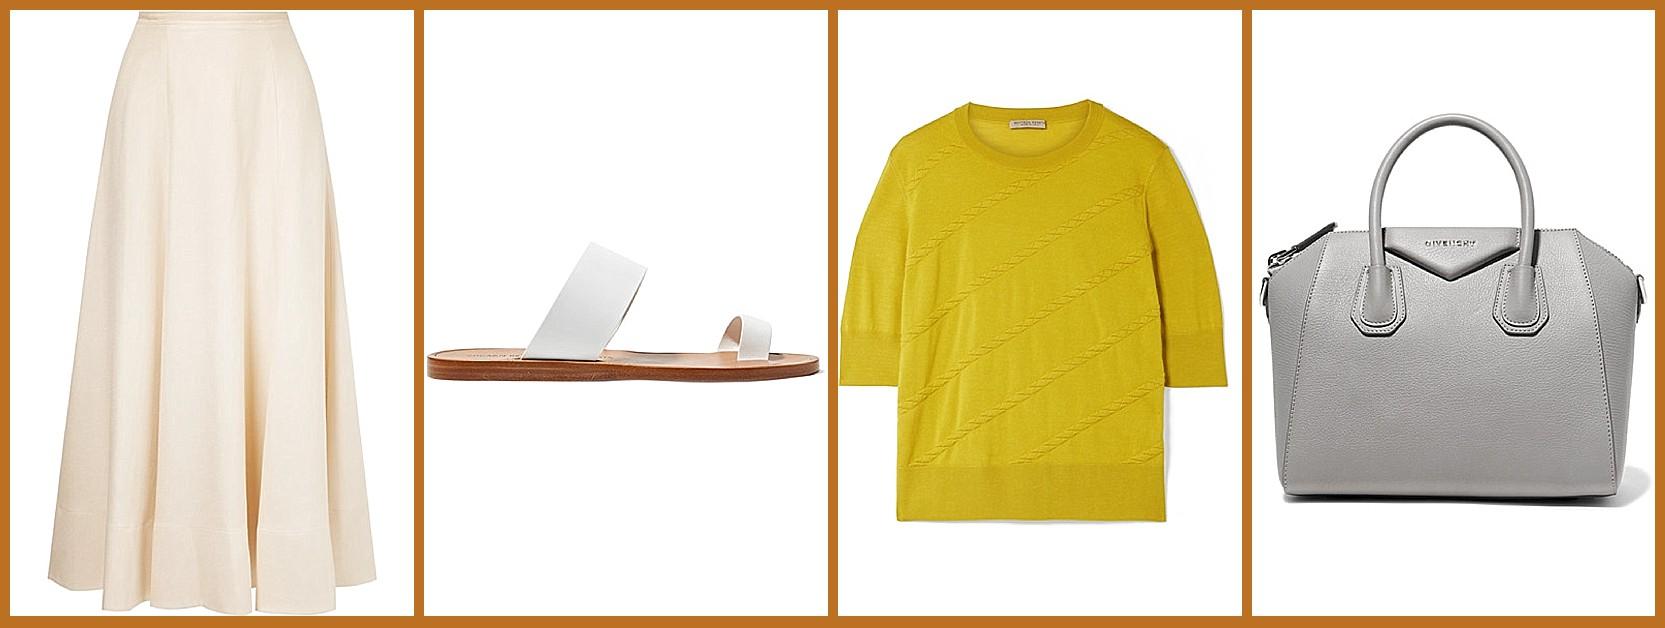 From netaporter: Elizabeth and James skirt, Common Projects sandals, Bottega Veneta top, Givenchy bag